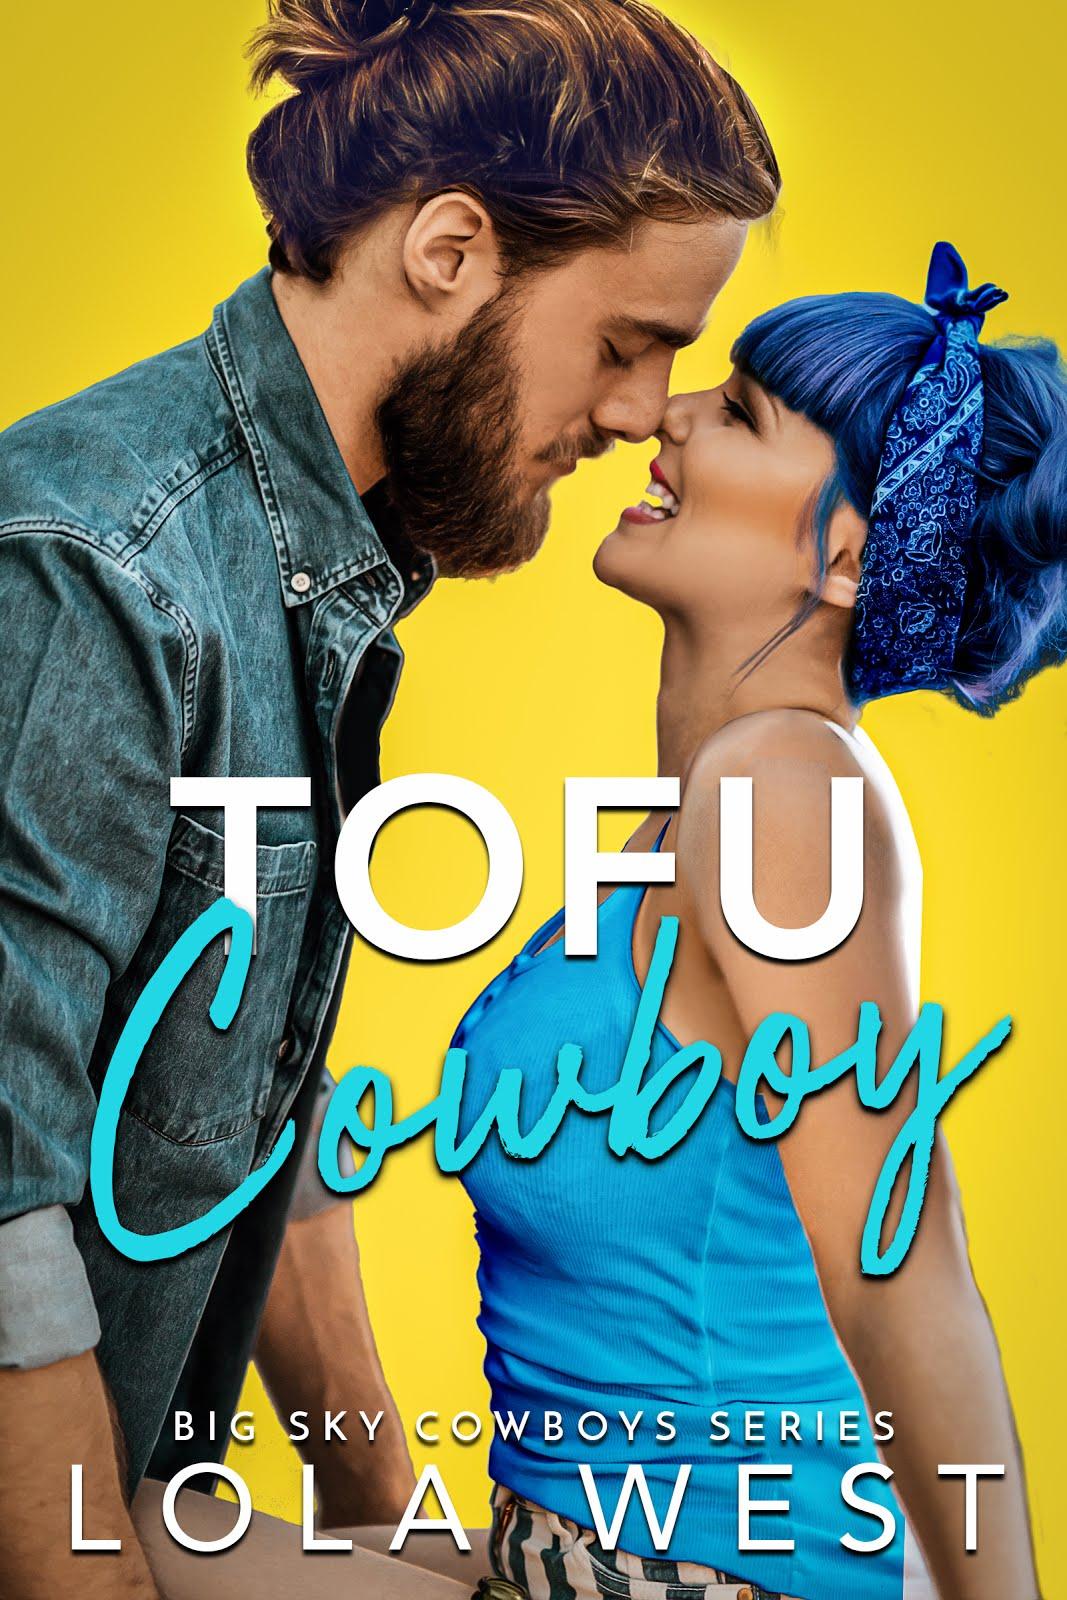 Tofu Cowboy